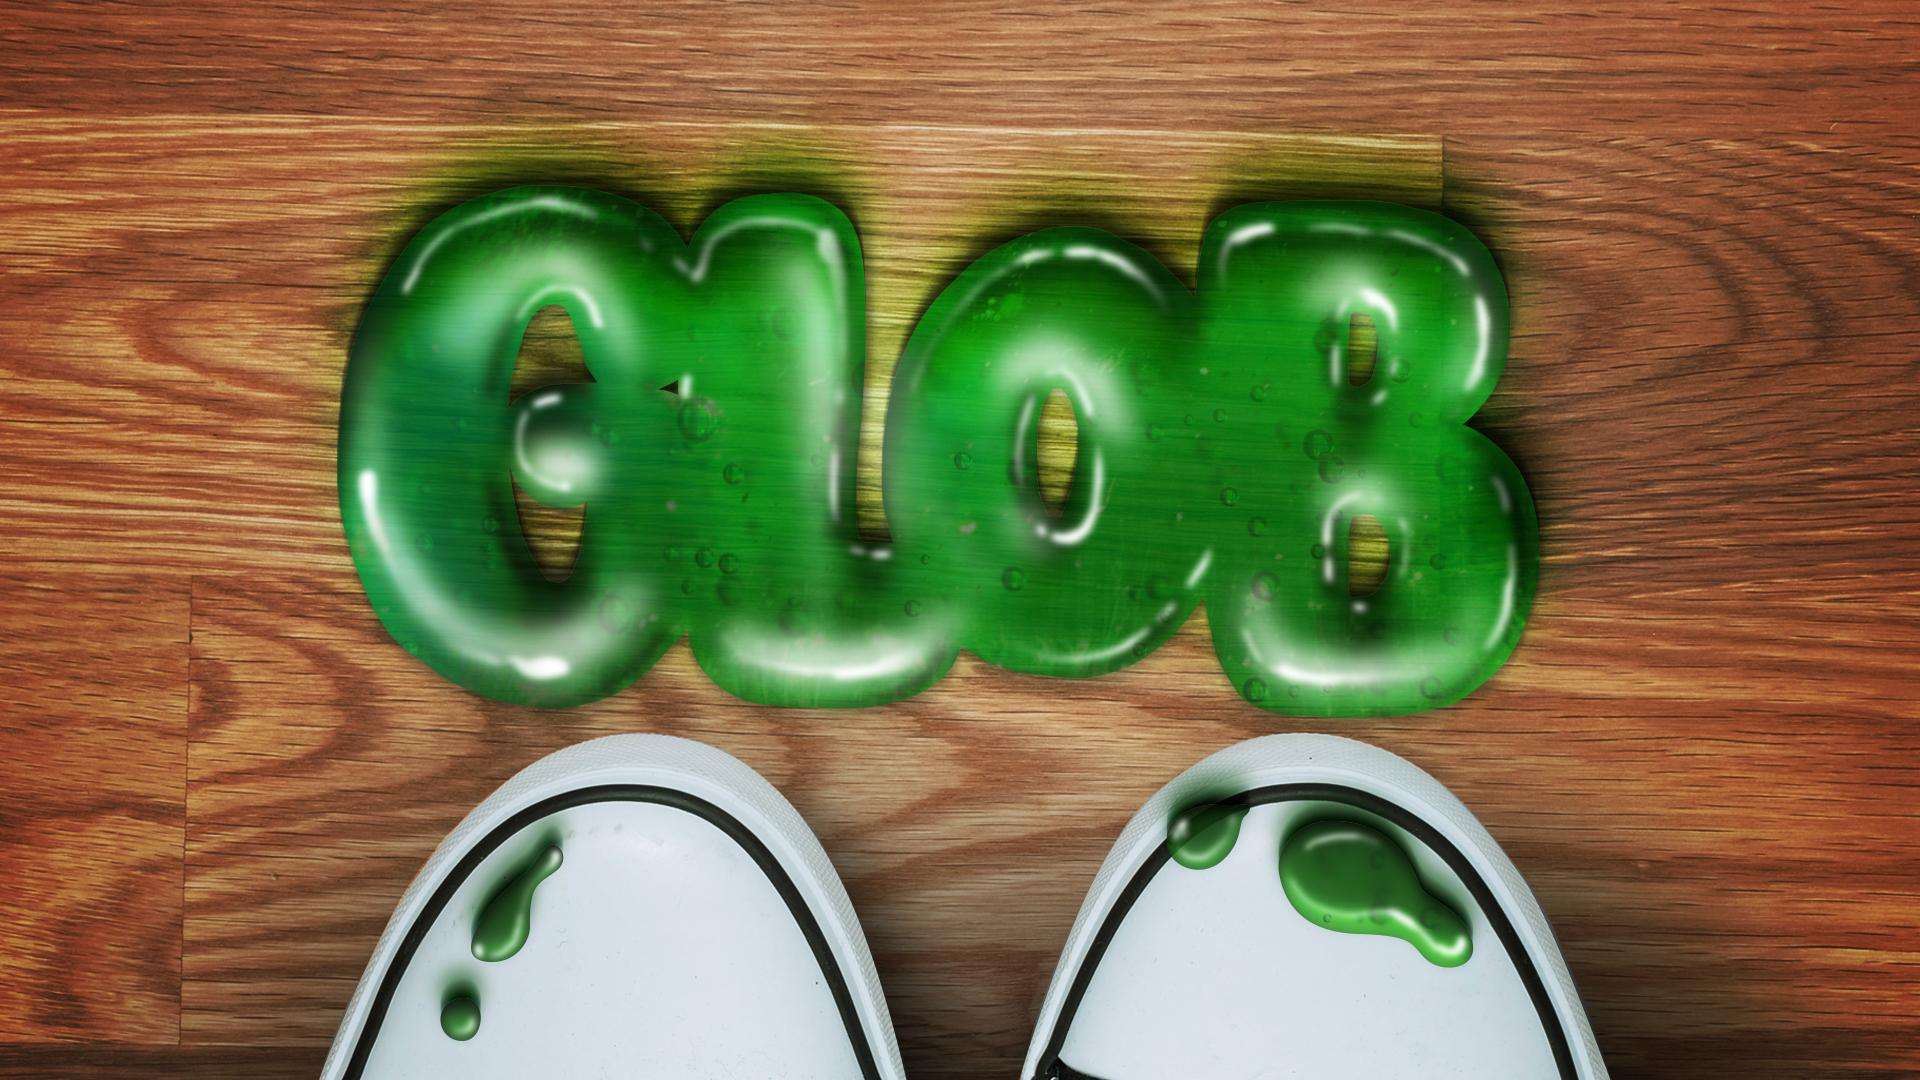 Clorox_glob_01.jpg